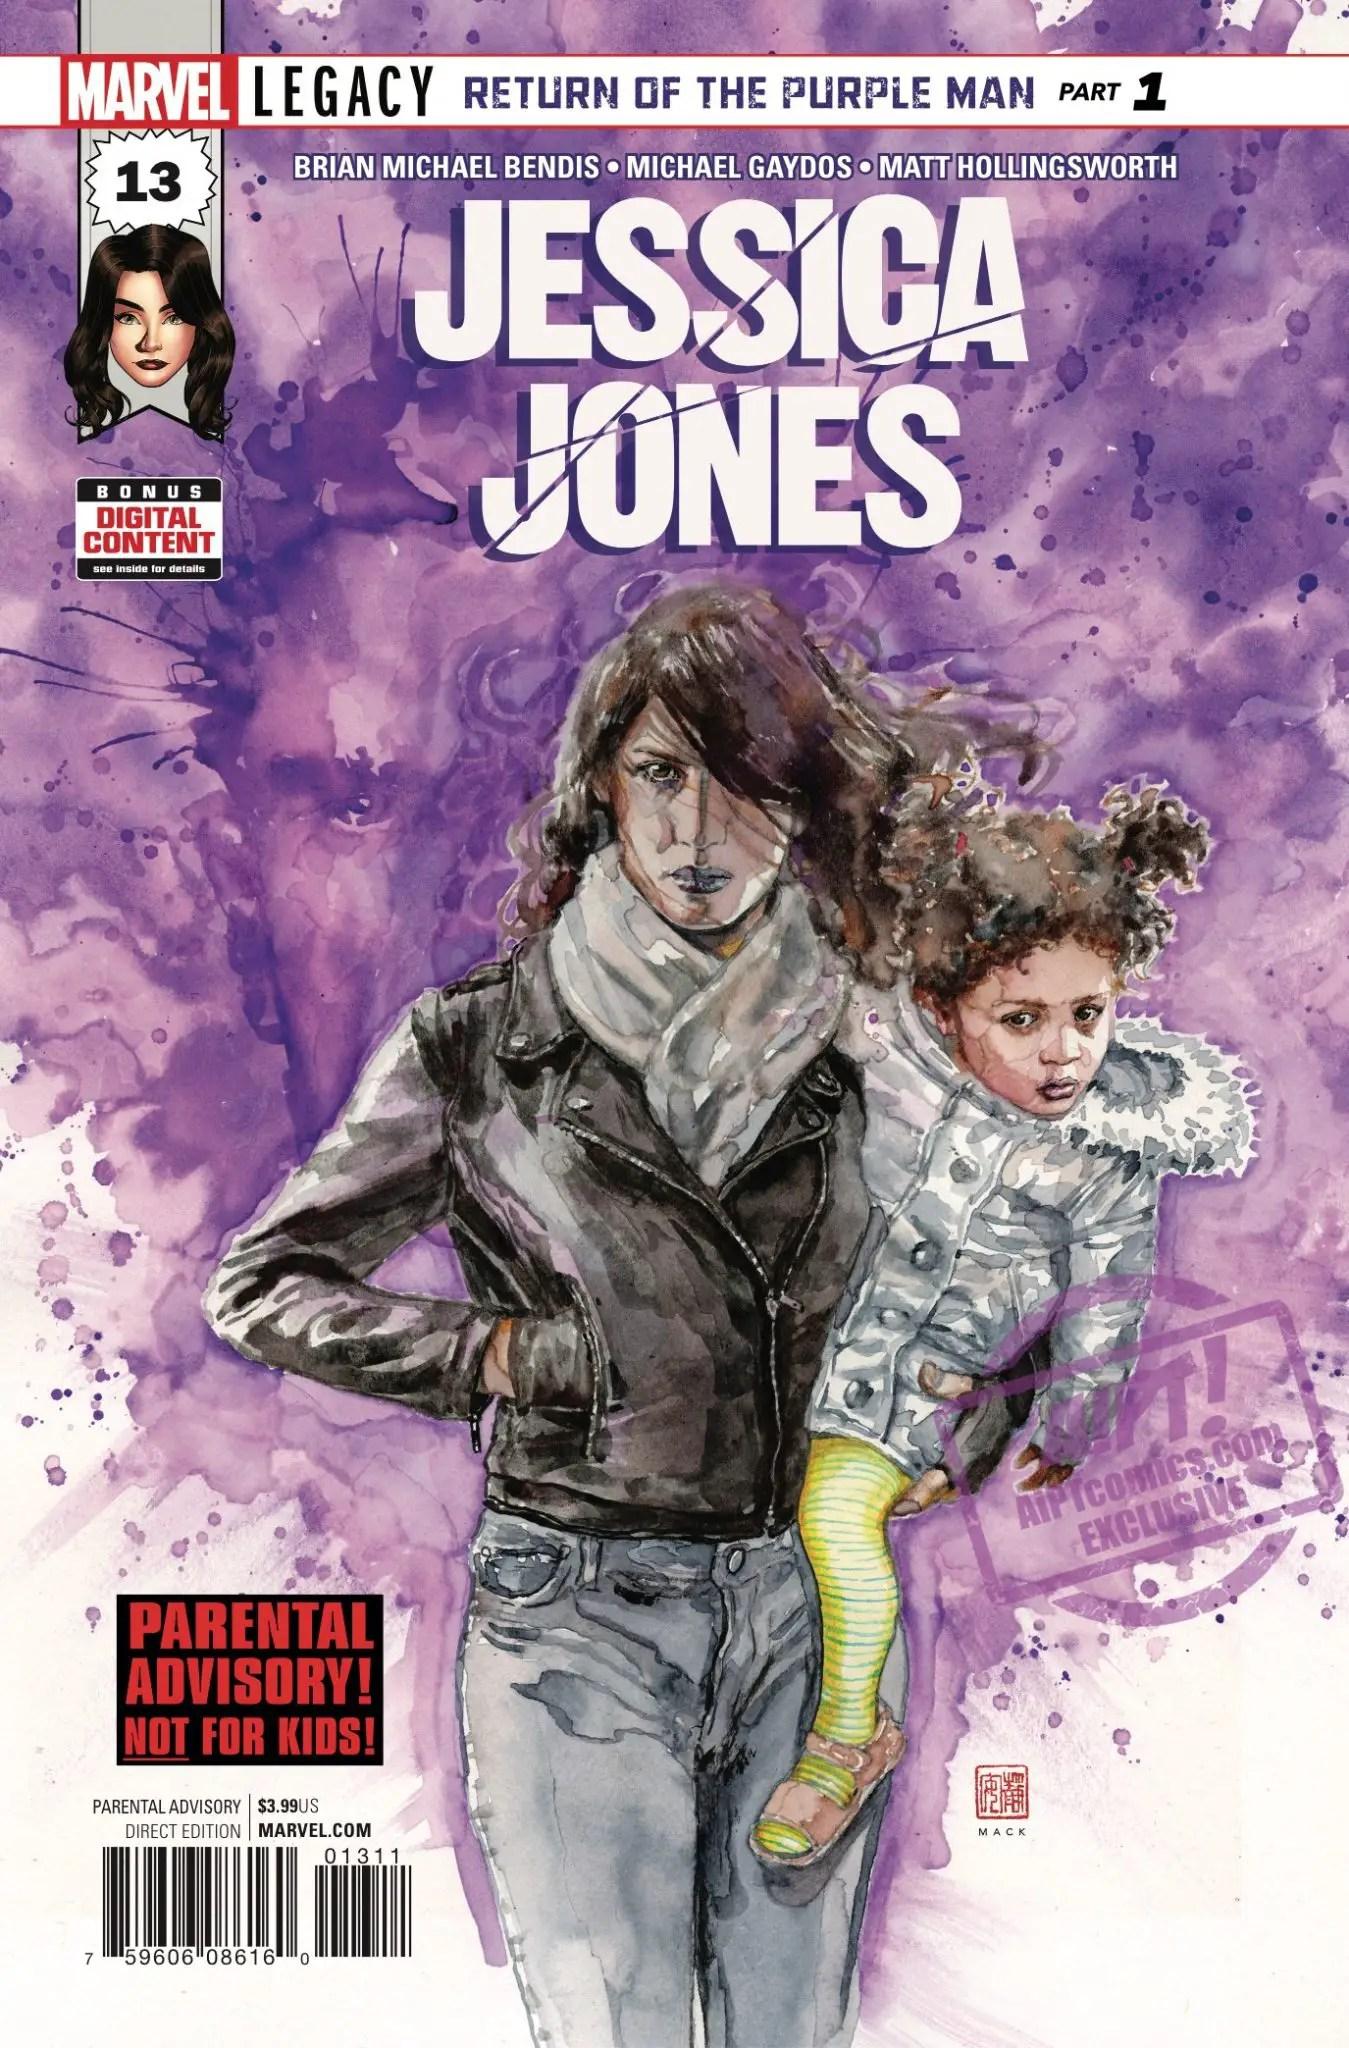 Jessica Jones #13 Review